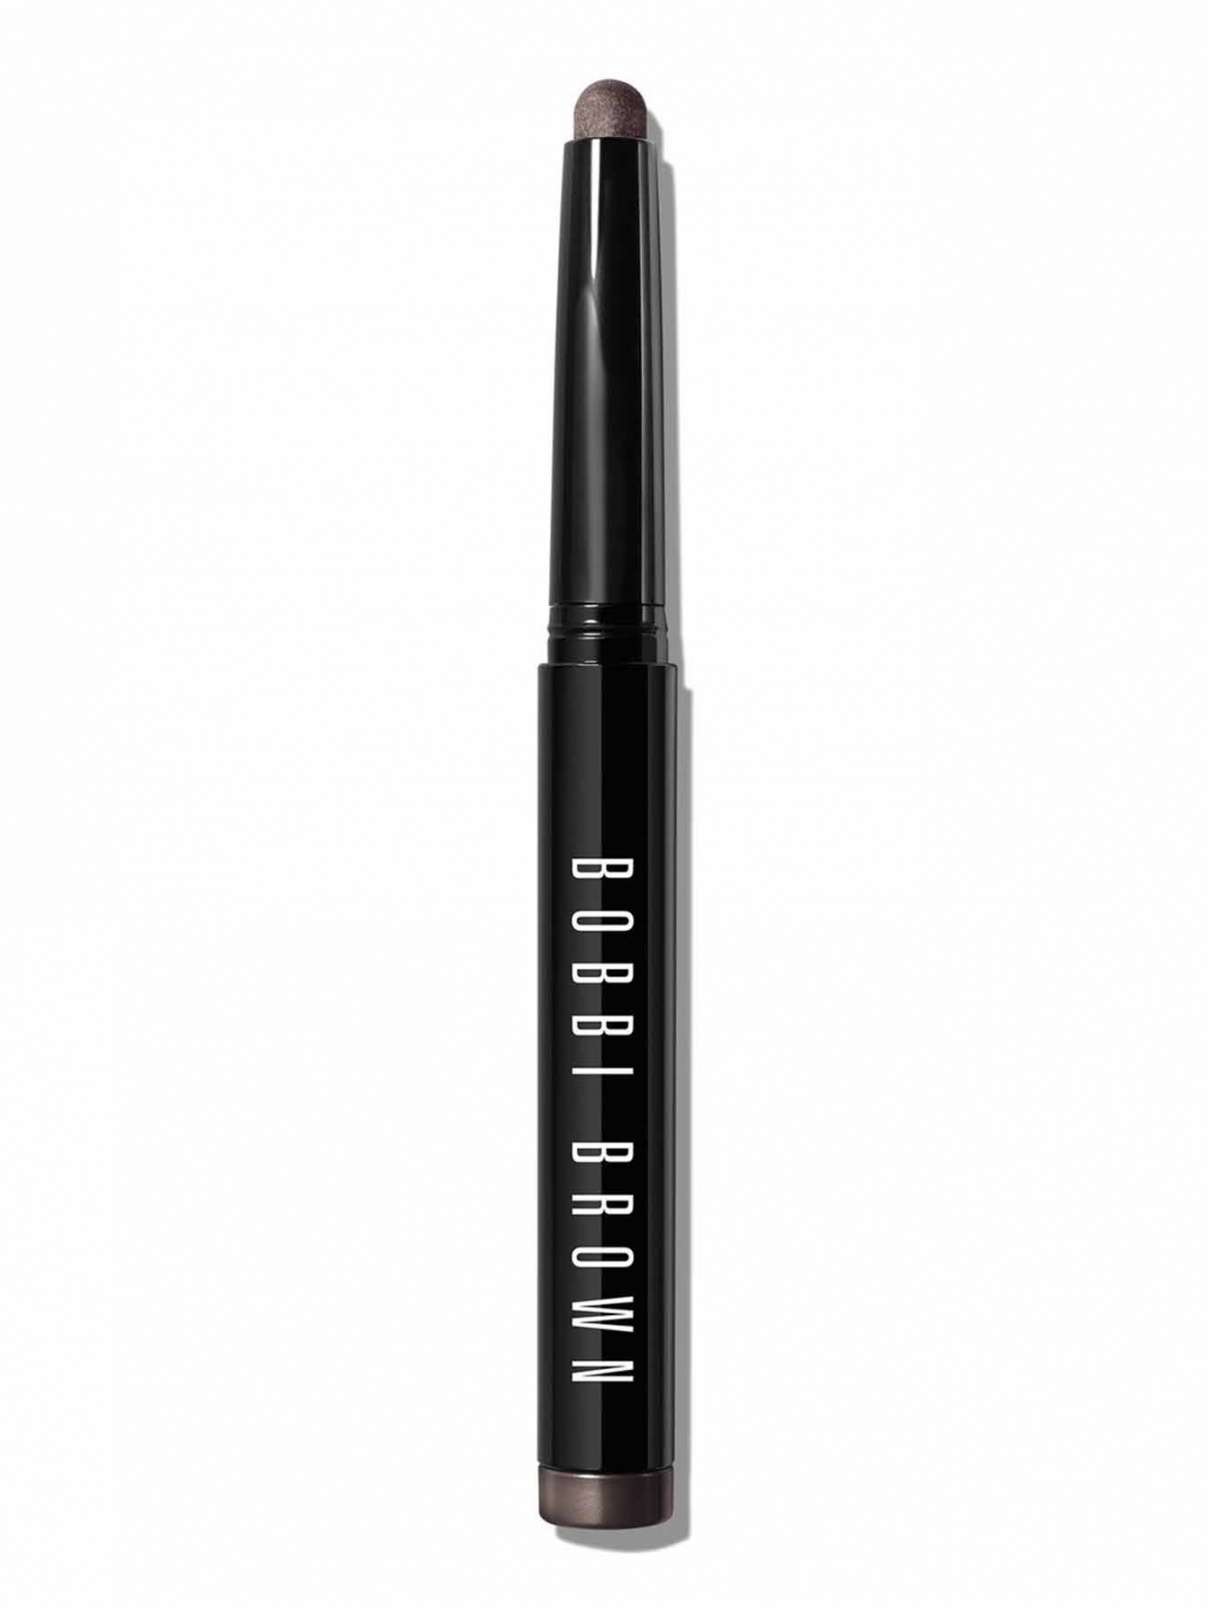 Кремовые тени в карандаше - Heather Steel, Long-Wear Bobbi Brown  –  Общий вид